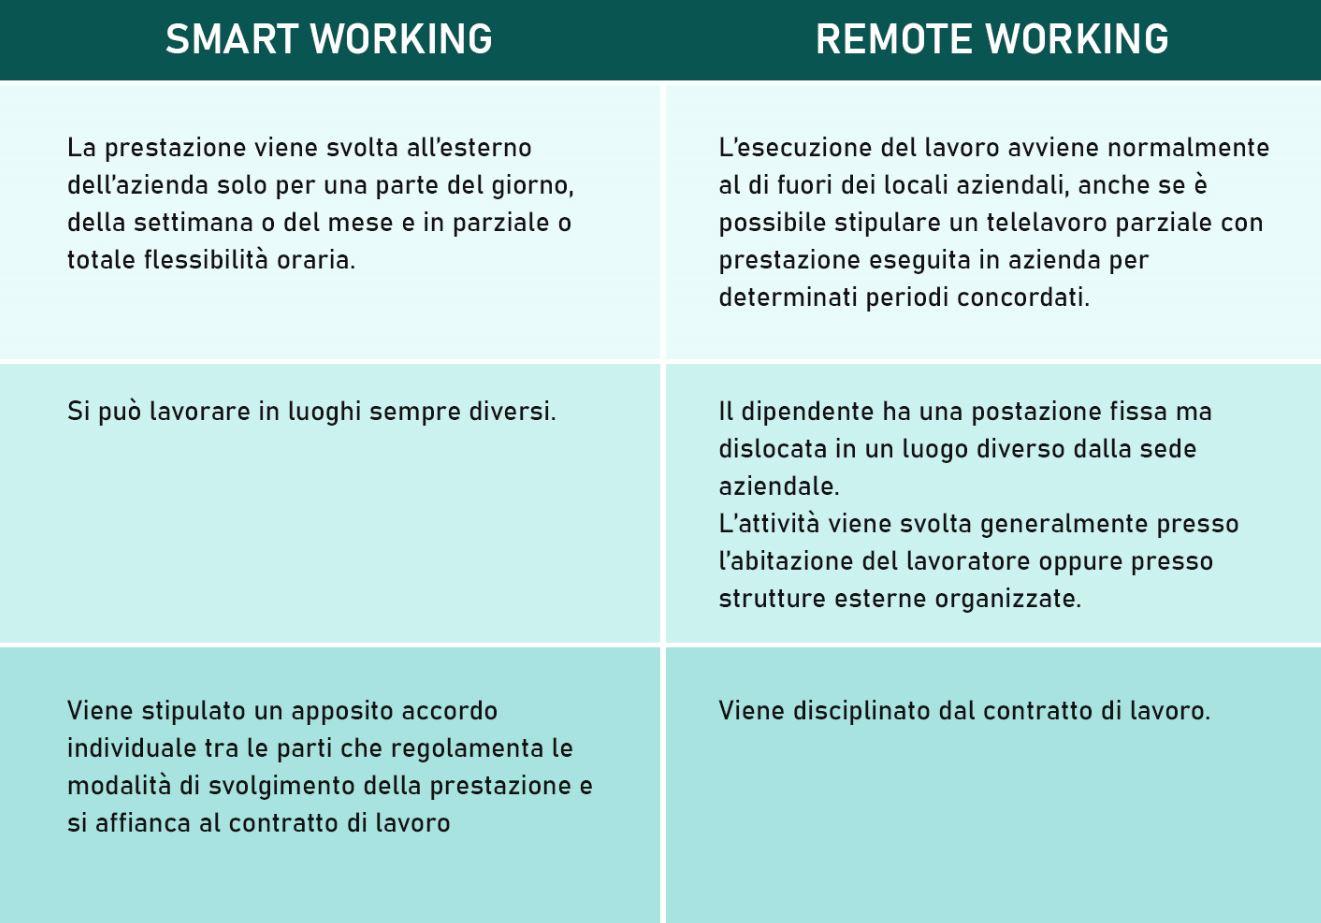 tabella smart working